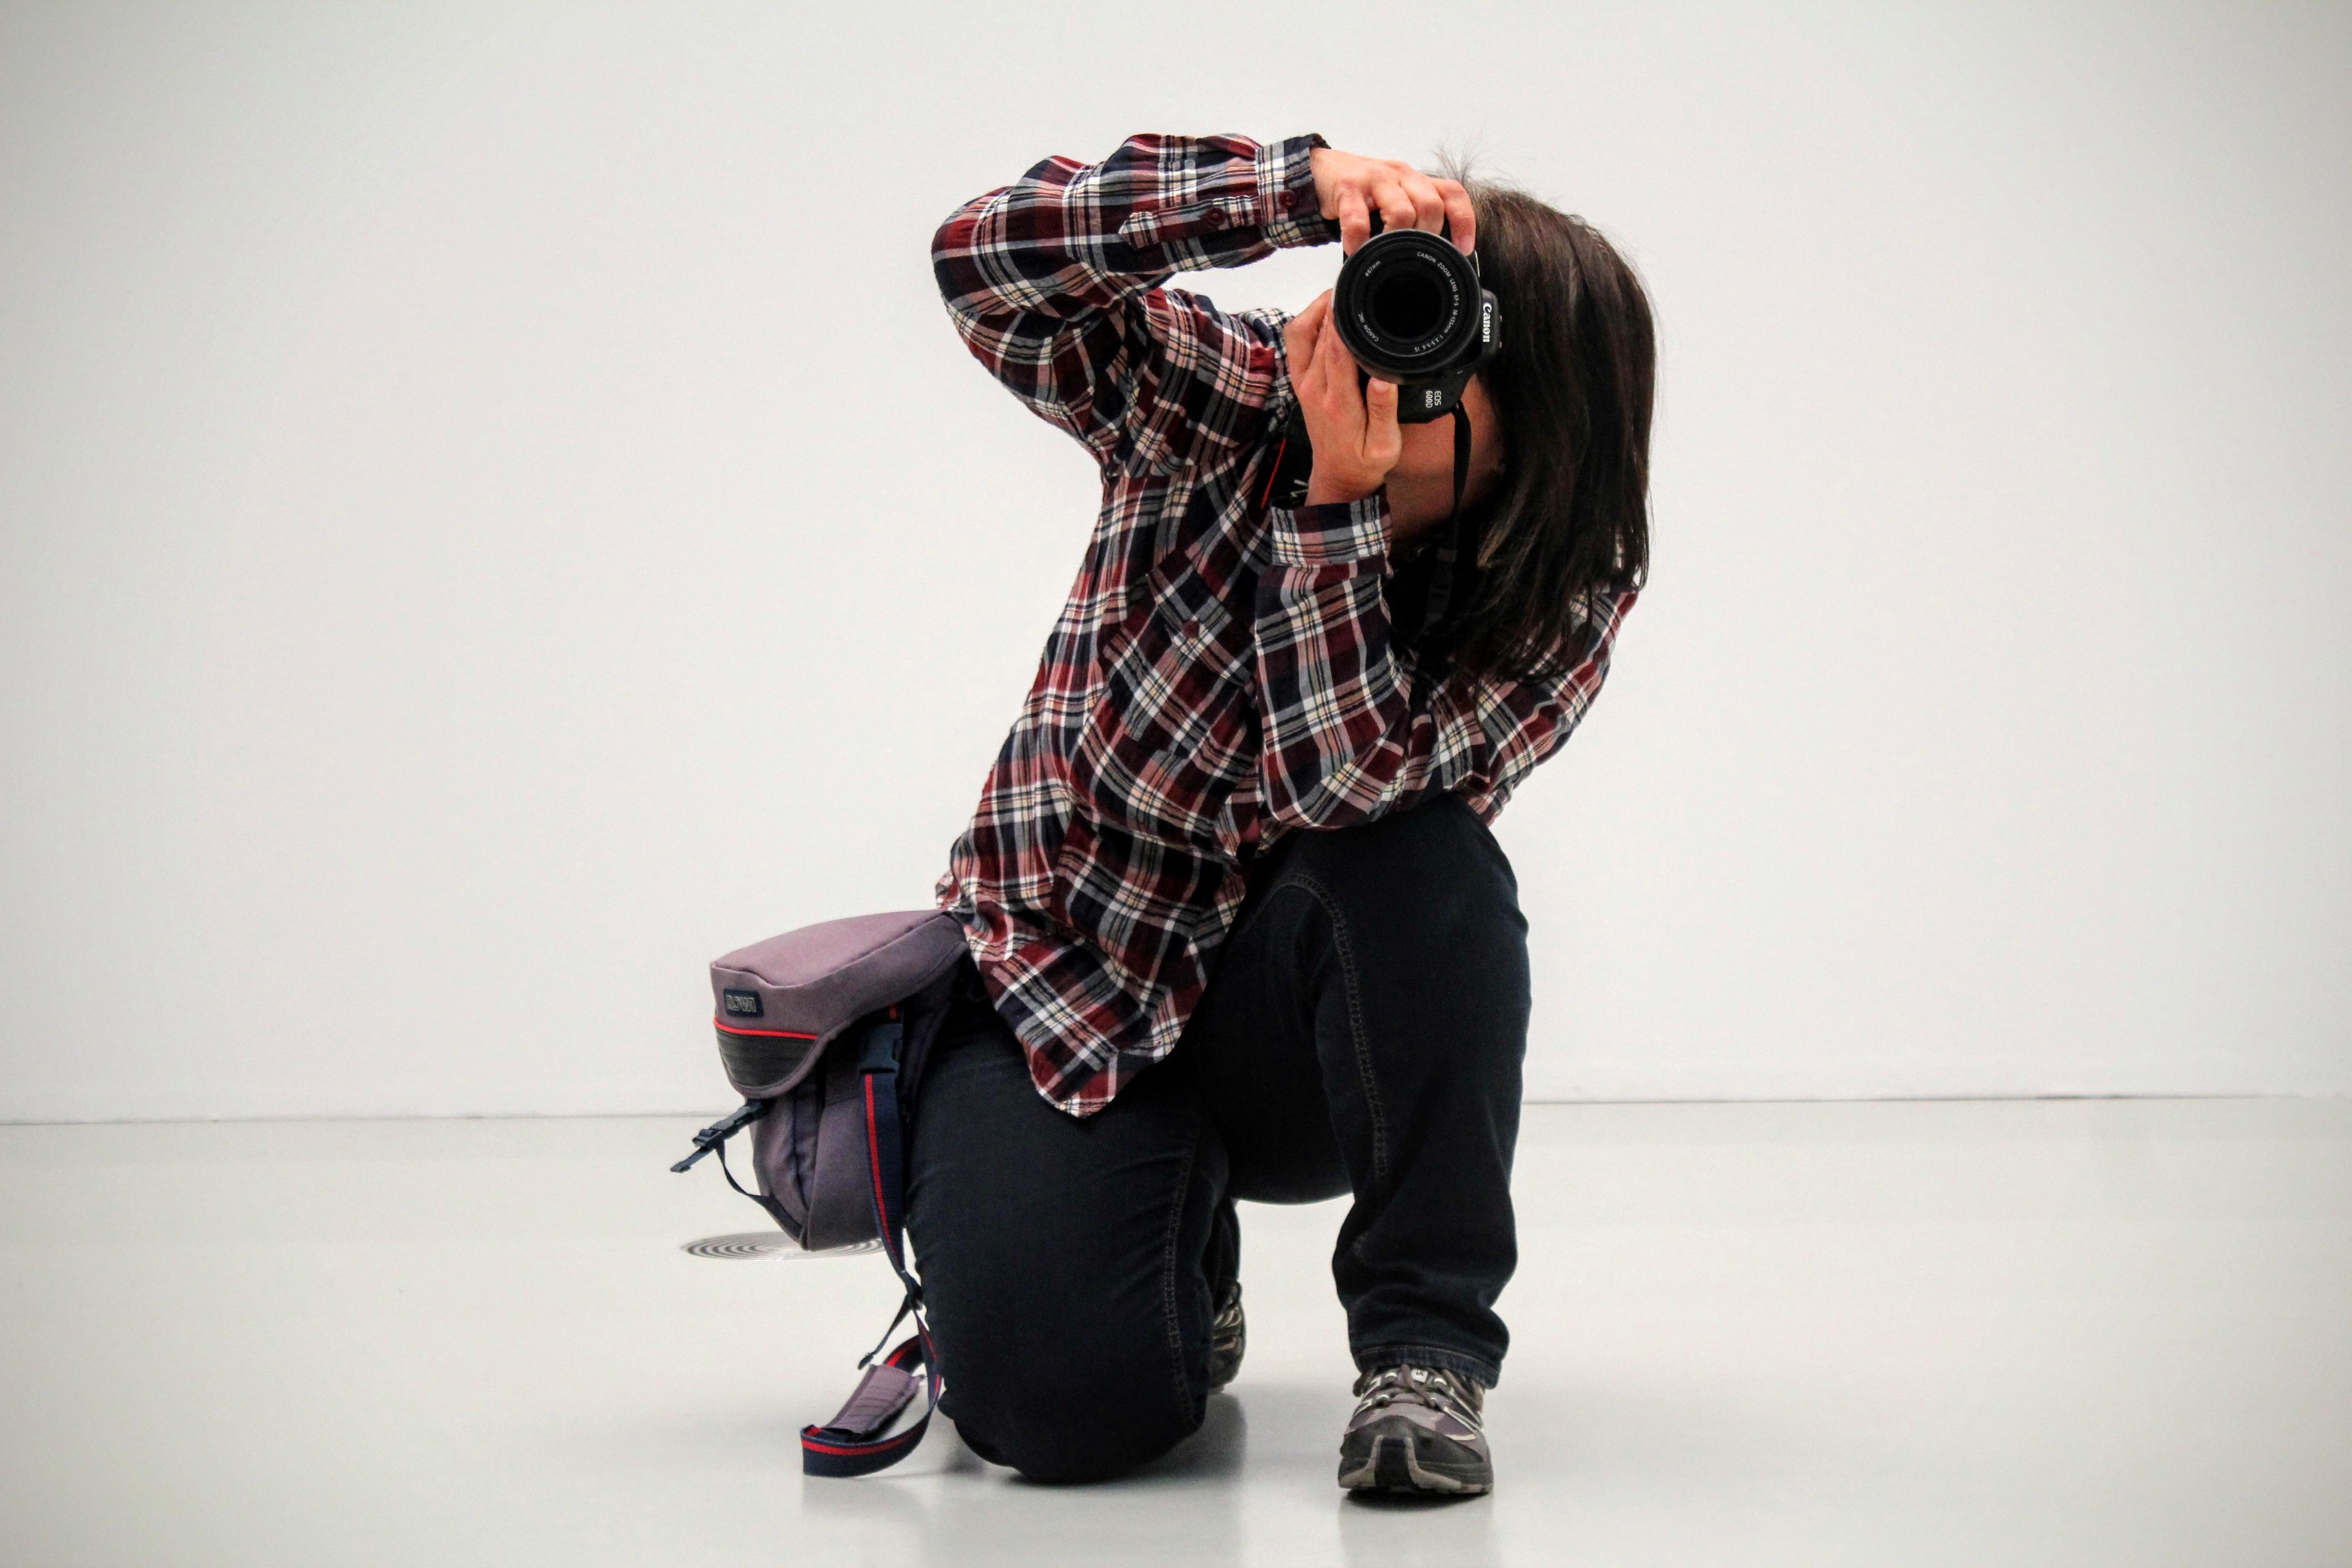 zapato cámara fotografía fotógrafo hembra baile patrón modelo primavera  rojo lente Moda ropa negro vestir diseño cf919538237